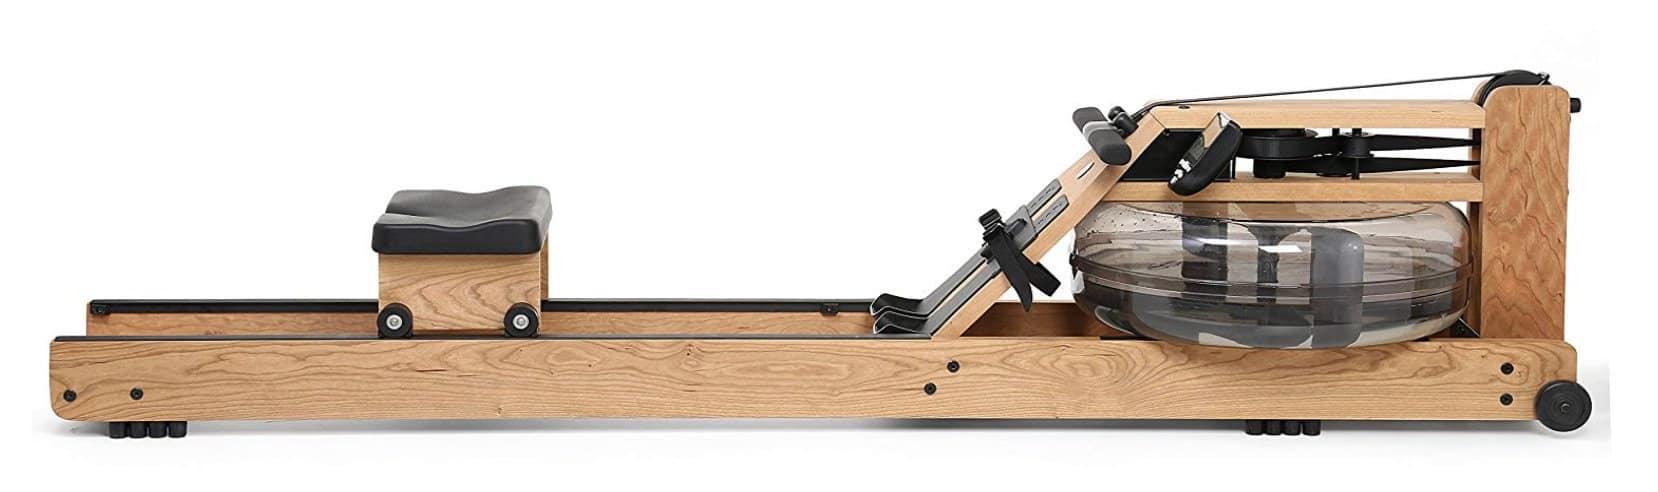 Water Rower Oxbridge Rowing Machine